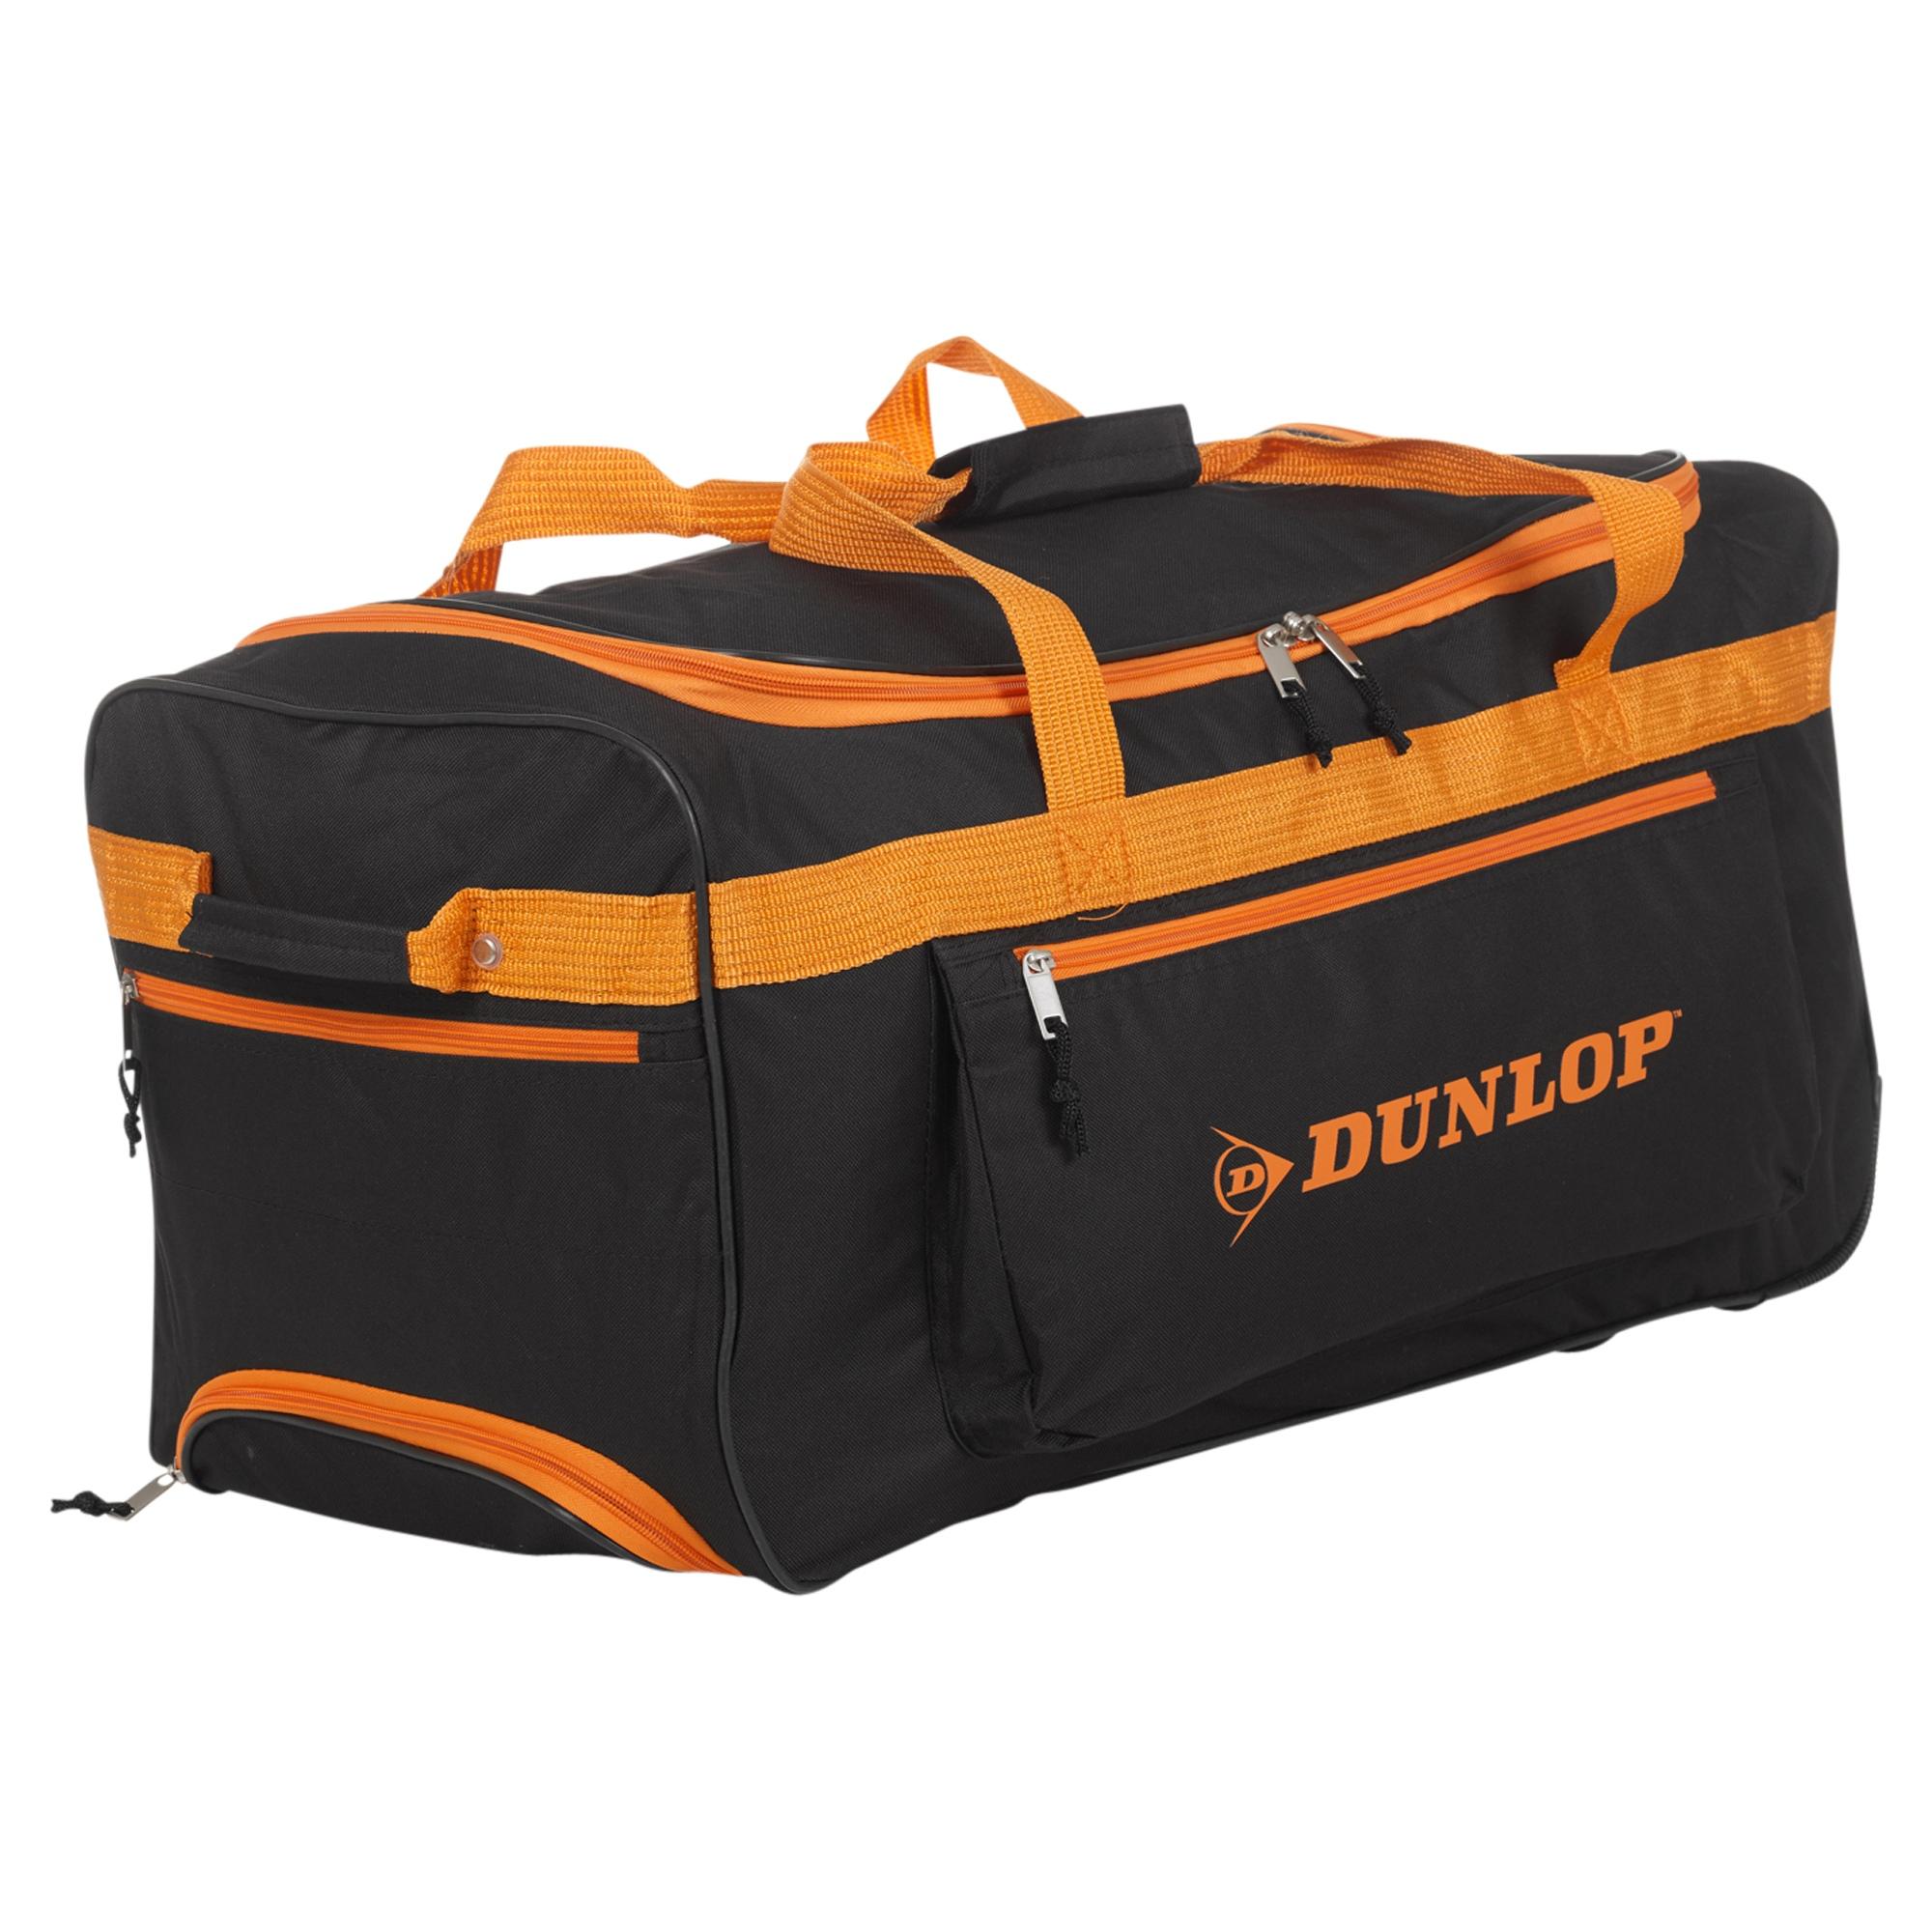 dunlop sports travel bag trolley handle wheels luggage carry gym lightweight new ebay. Black Bedroom Furniture Sets. Home Design Ideas